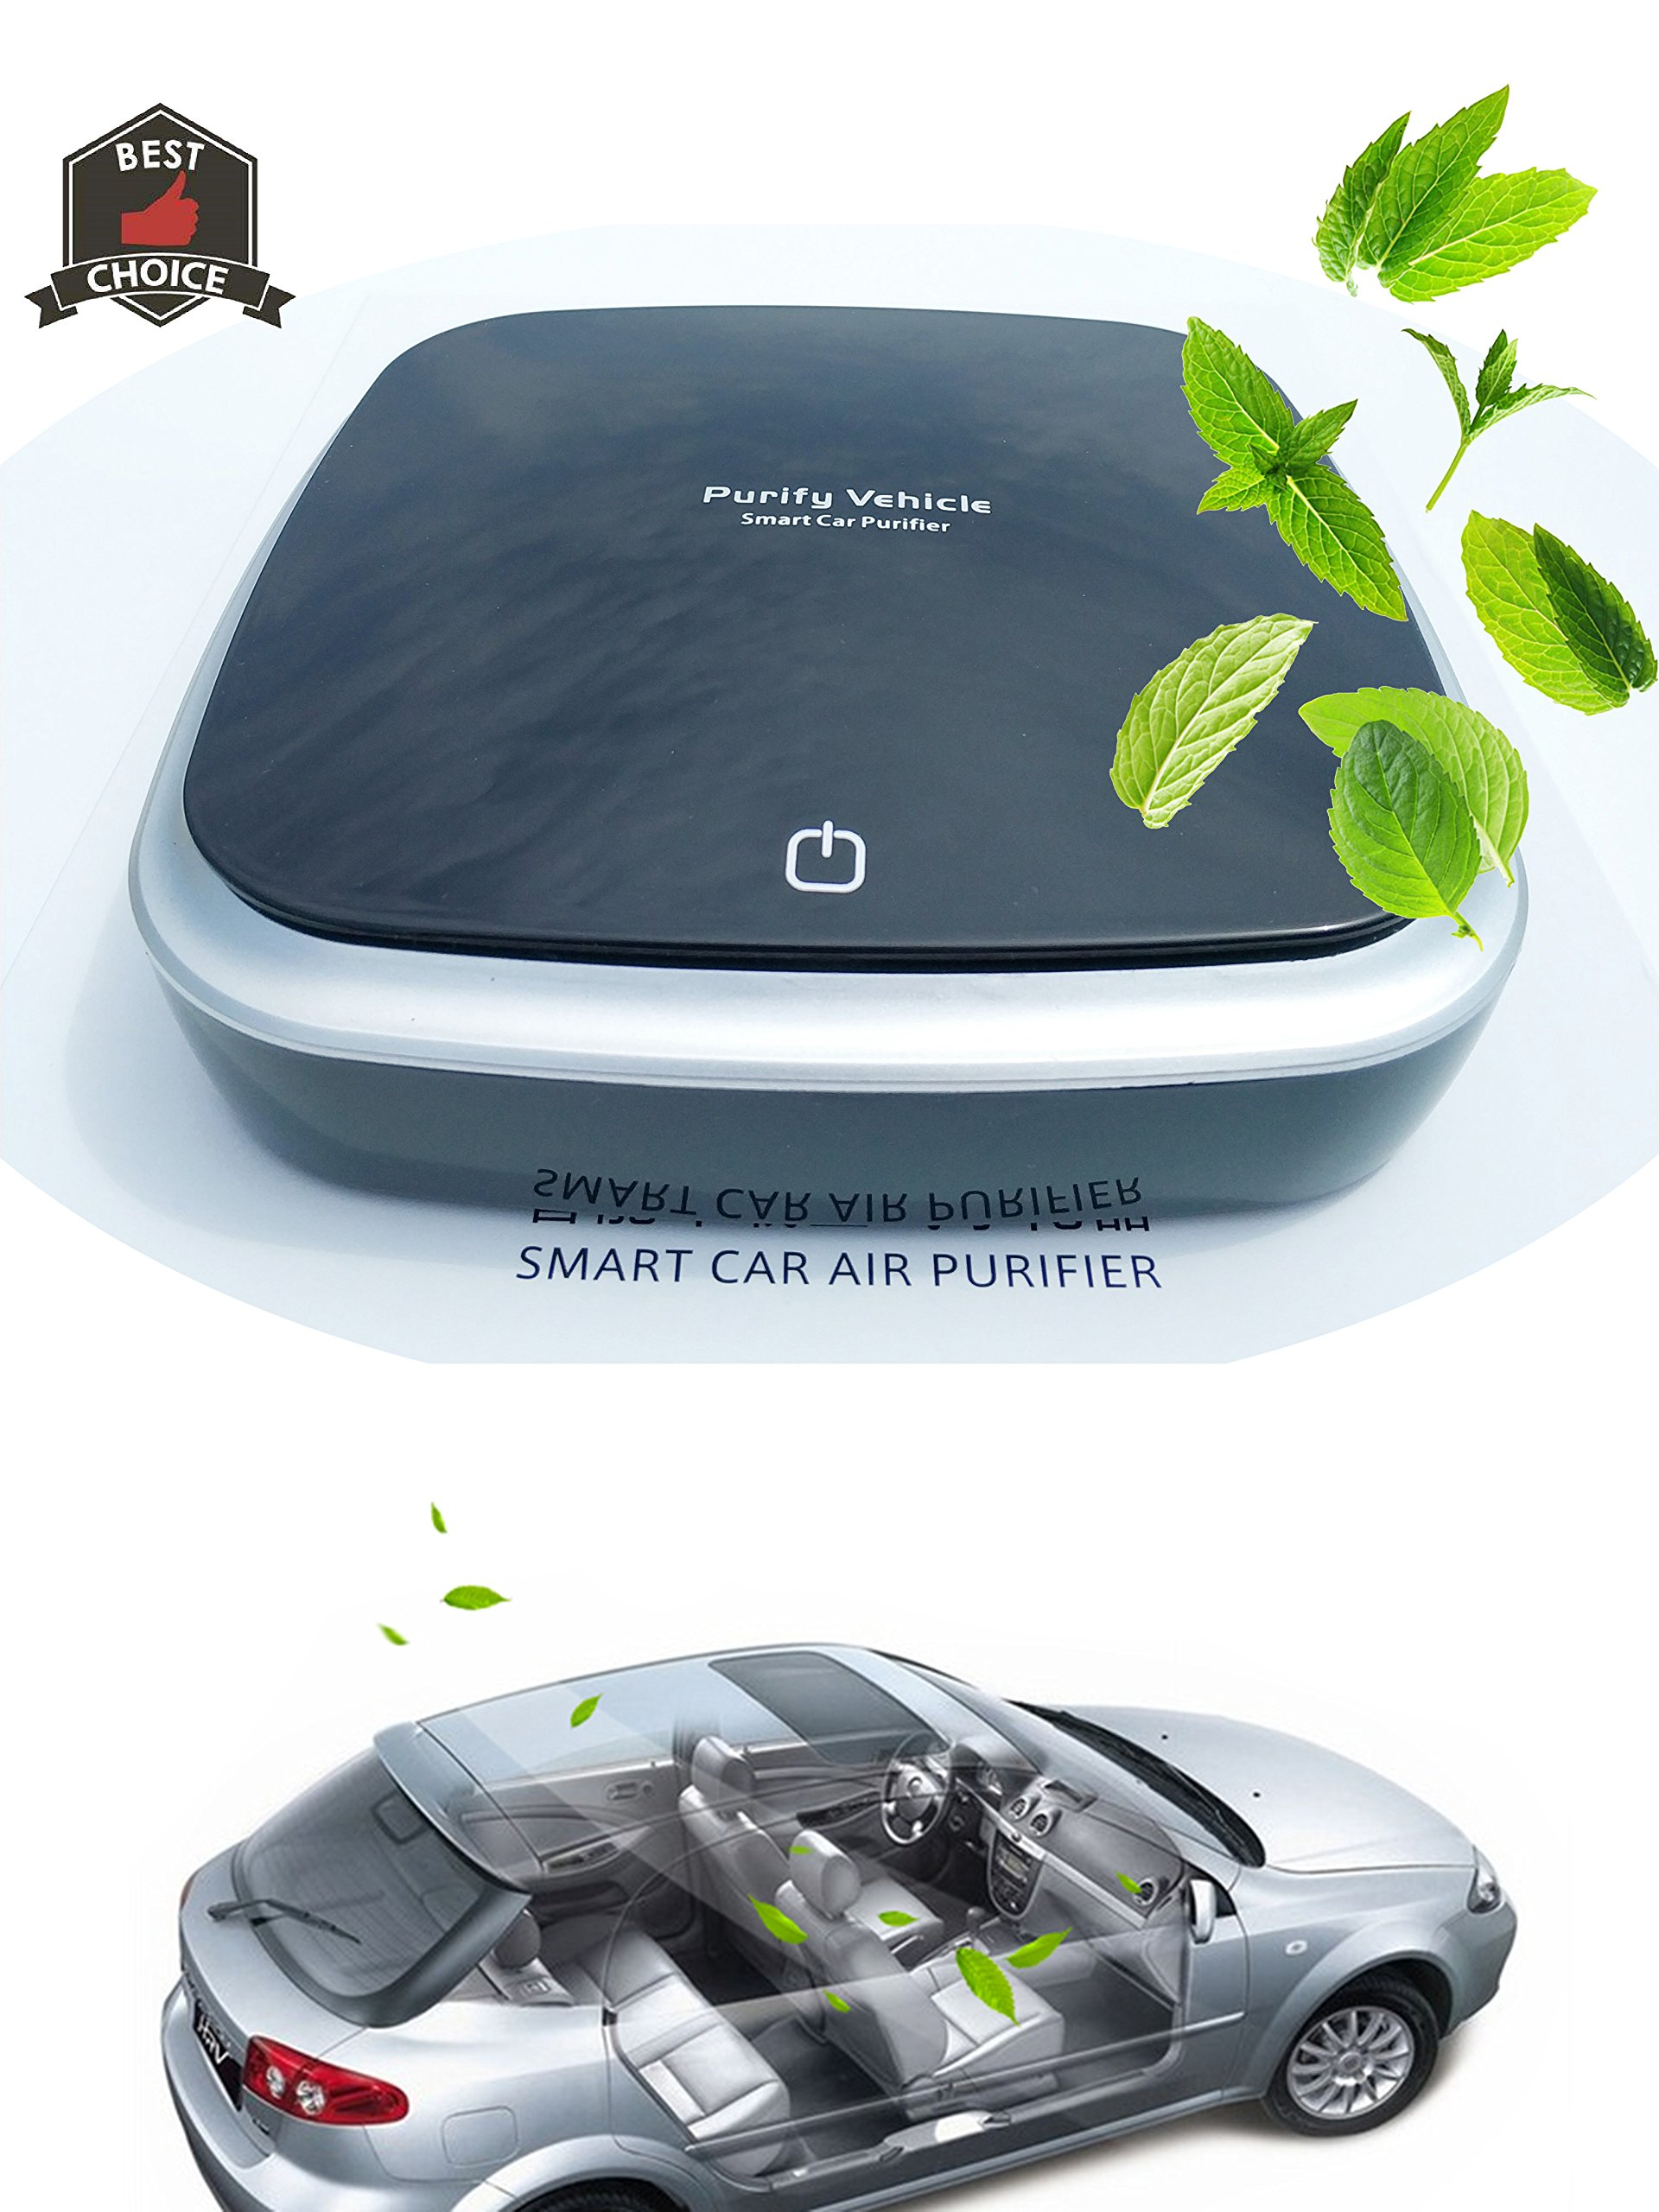 HiRui Car Air Purifier, Negative ions Car Air Freshener Ionic Air Cleaner Aromatherapy Diffusers, HEPA/HESA Filter Net | Best Odors Eliminator Remove Formaldehyde, Tobacco Smoke (Black)